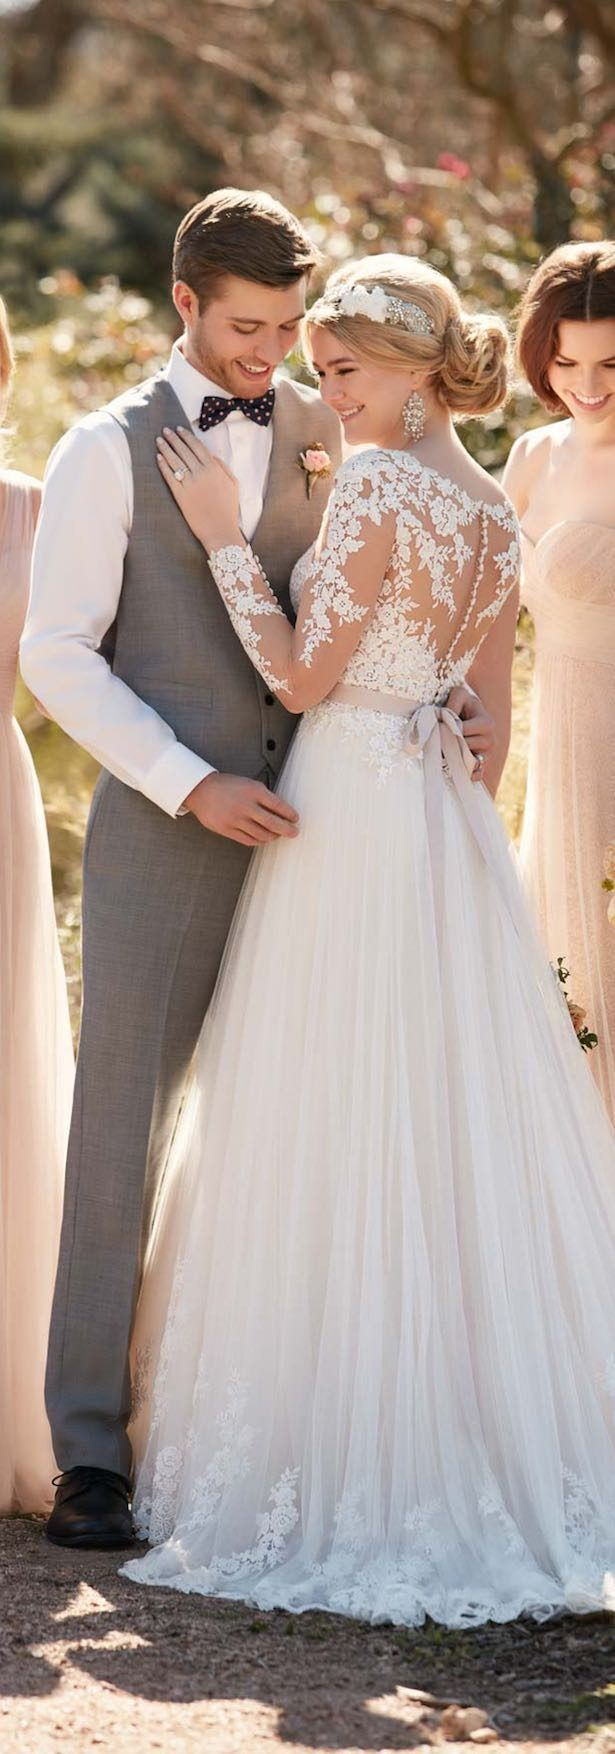 Essense wedding dress  Essense of Australia Fall    wedding dresses Fall  and